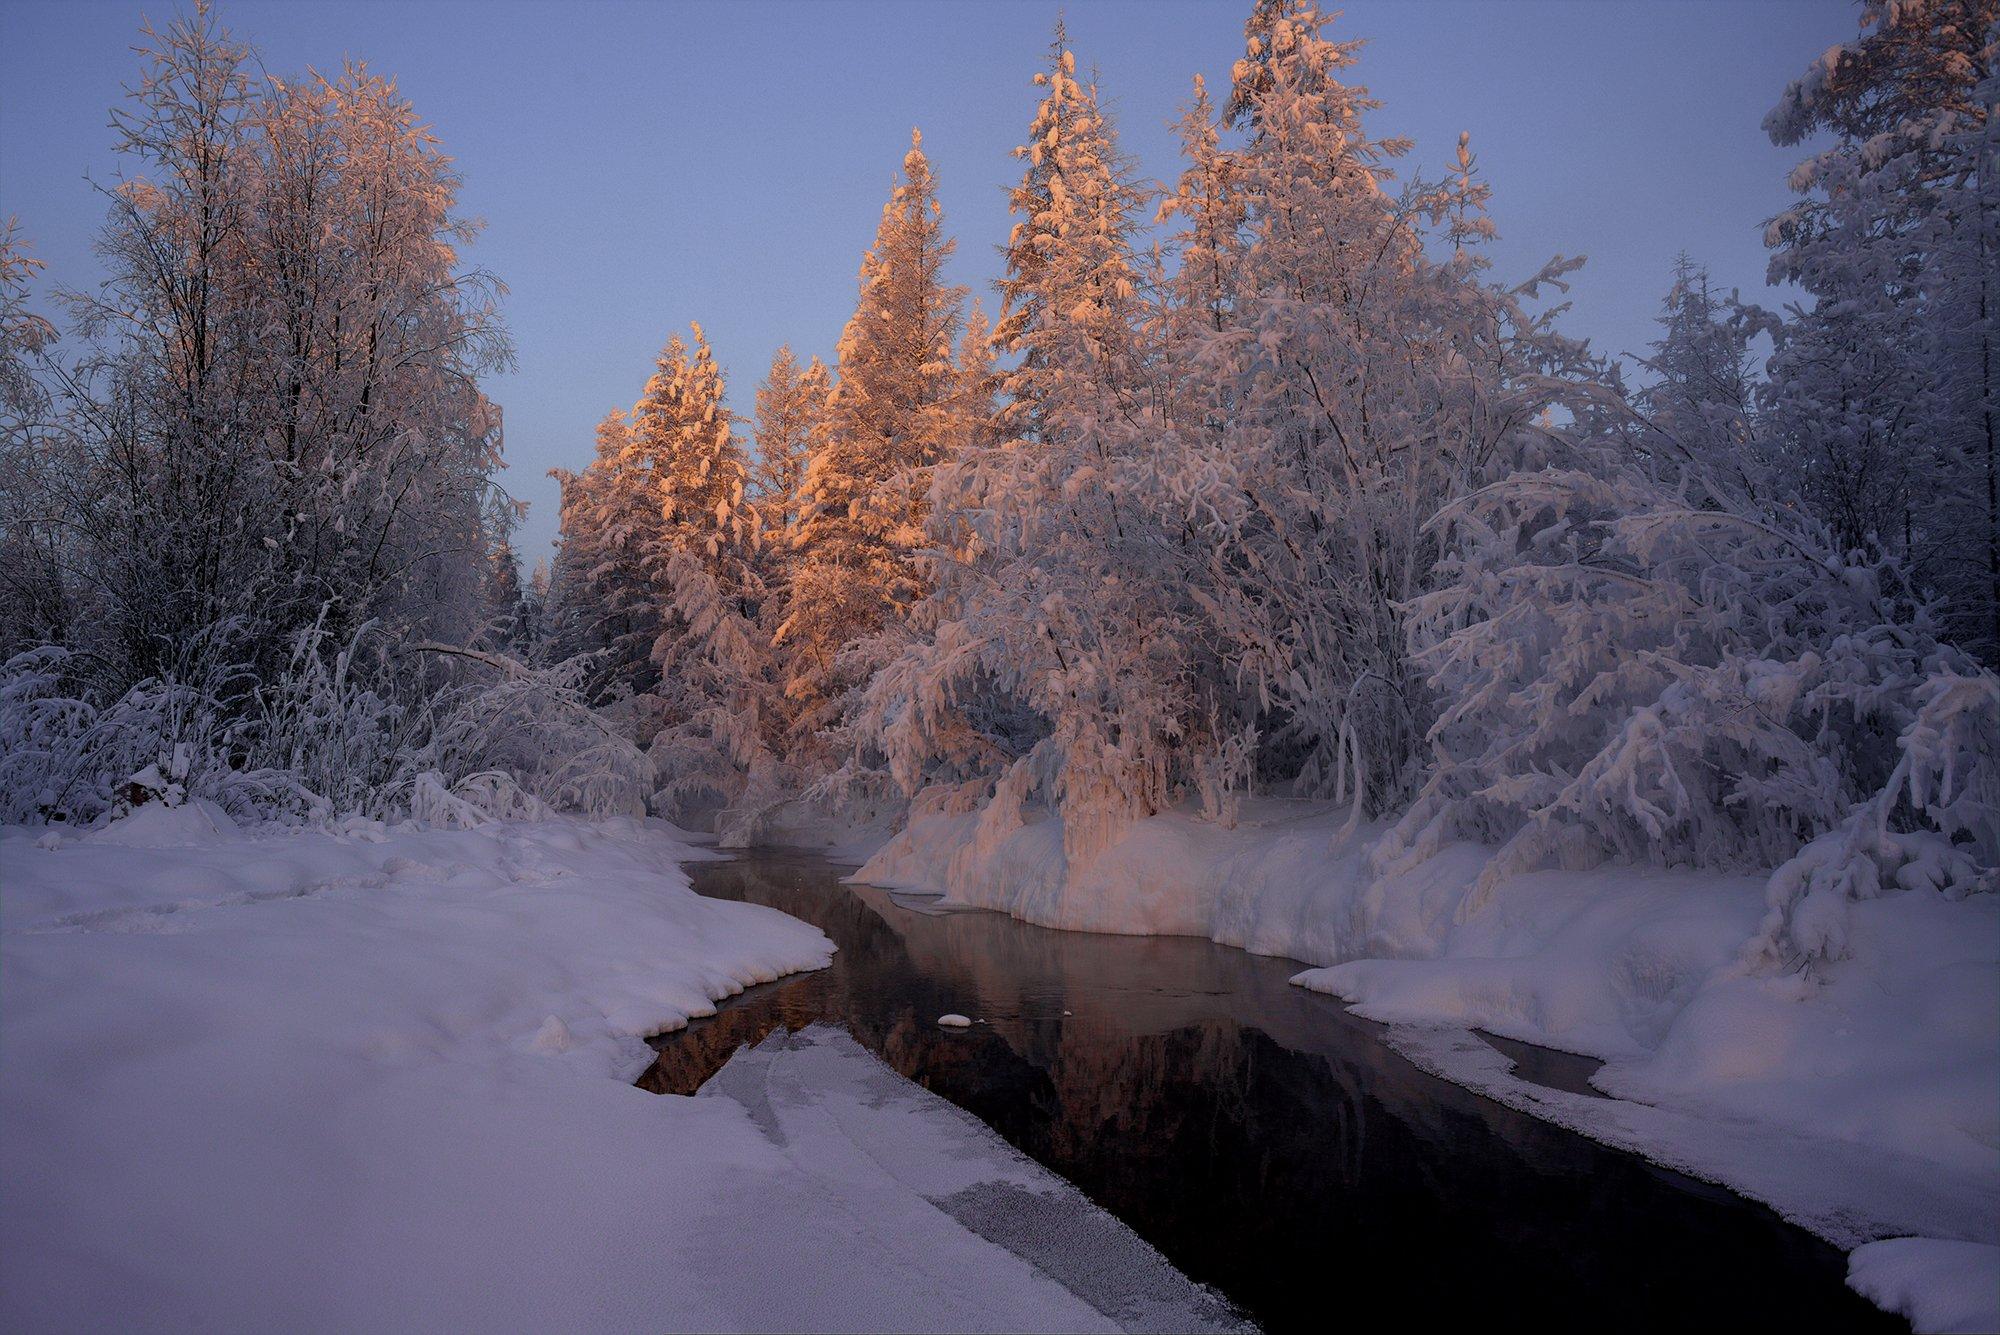 зима, холод, речка, снег, лед, якутия, ойиякон, полюс холода, природа, путешествия, Михаил Потапов